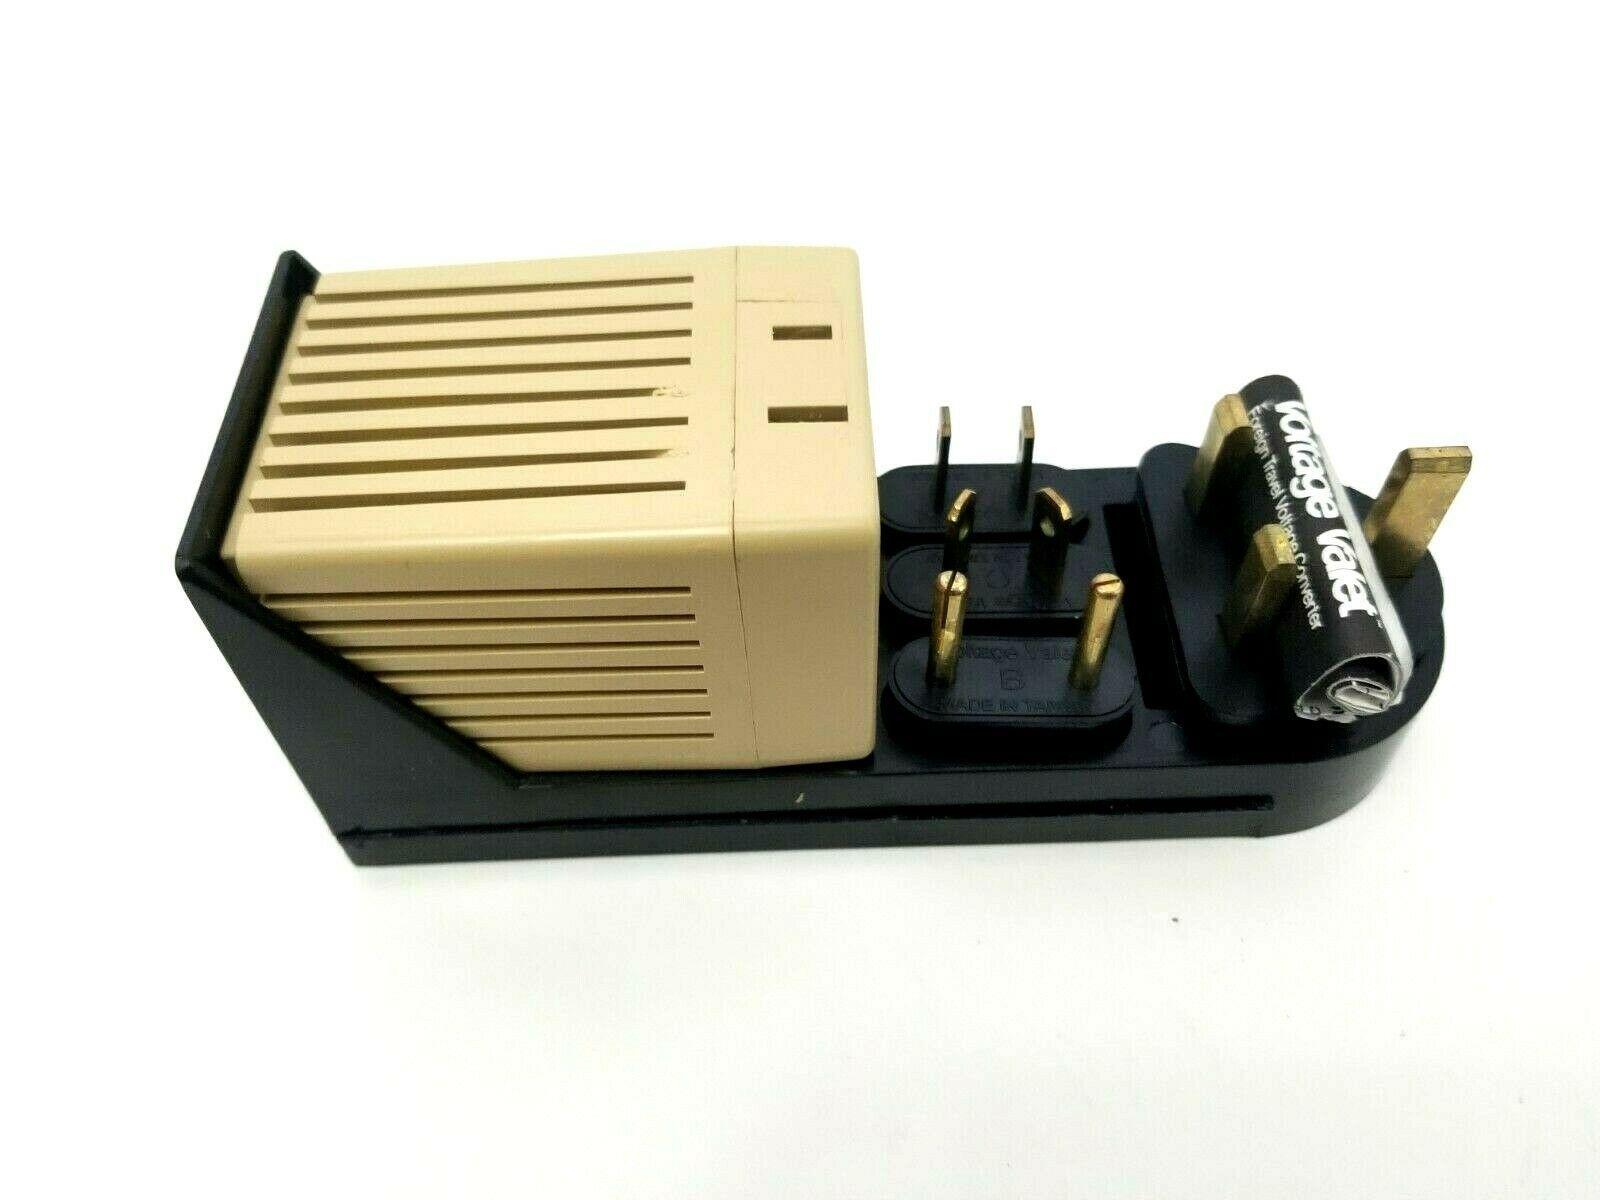 VOLTAGE VALET Foreign Electricity Converter Kit 50 Watt - Model V5PH New